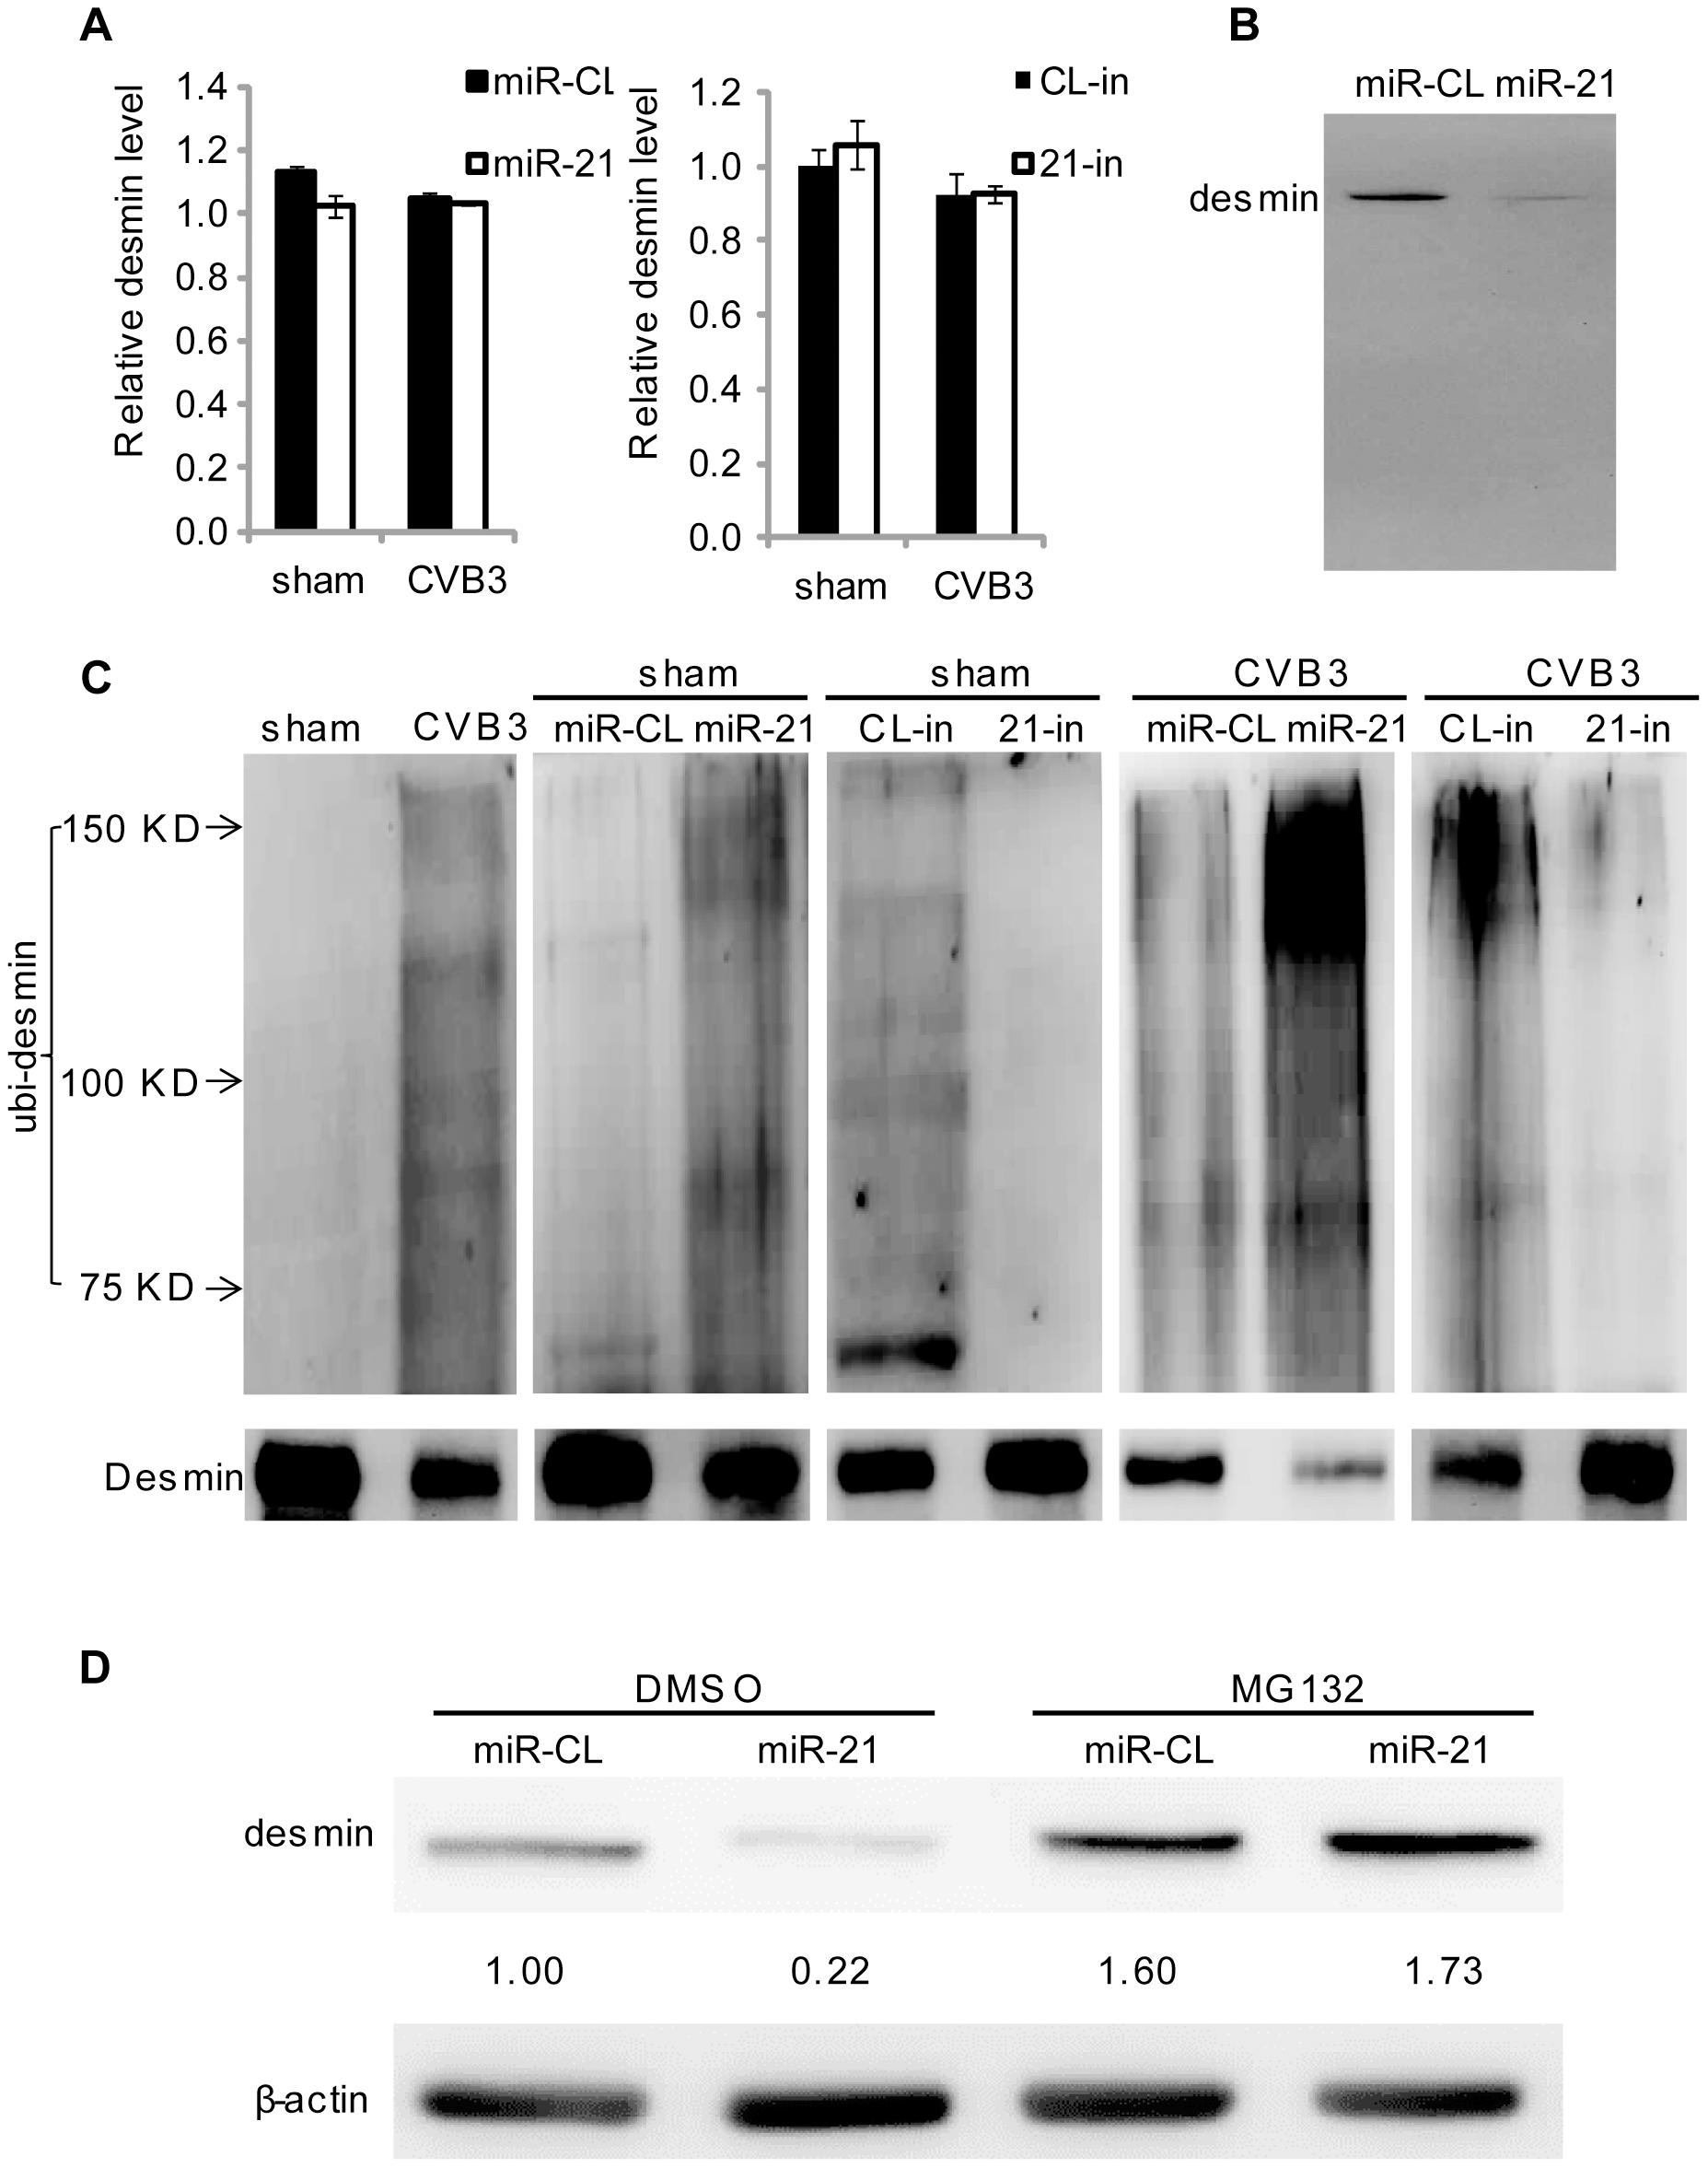 miR-21 promotes desmin degradation through the ubiquitin-proteasome pathway.